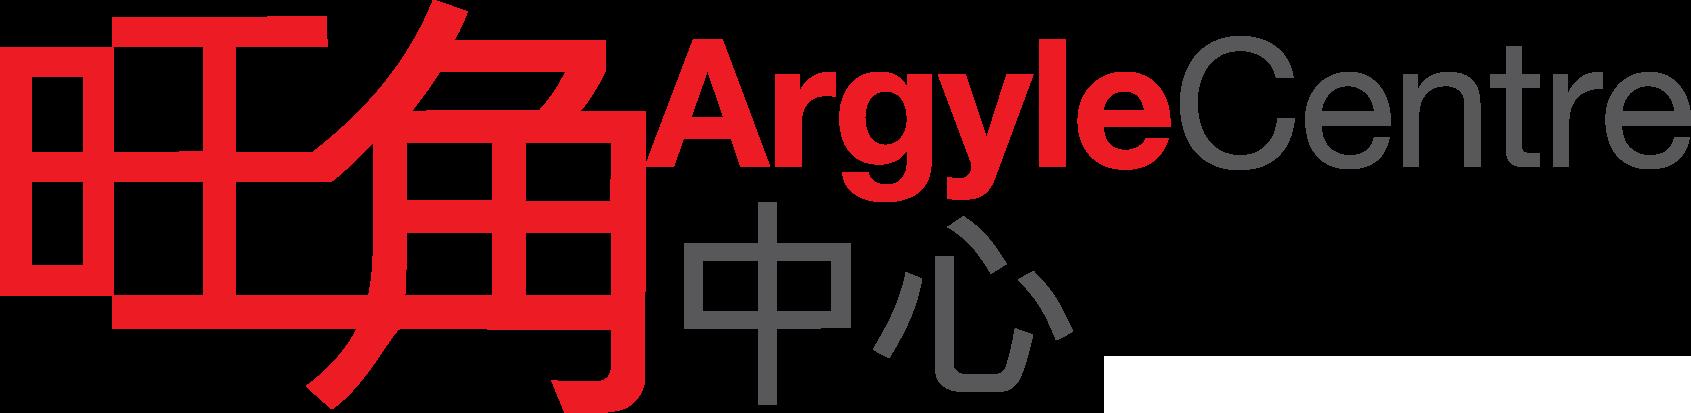 Argyle Centre 旺角中心